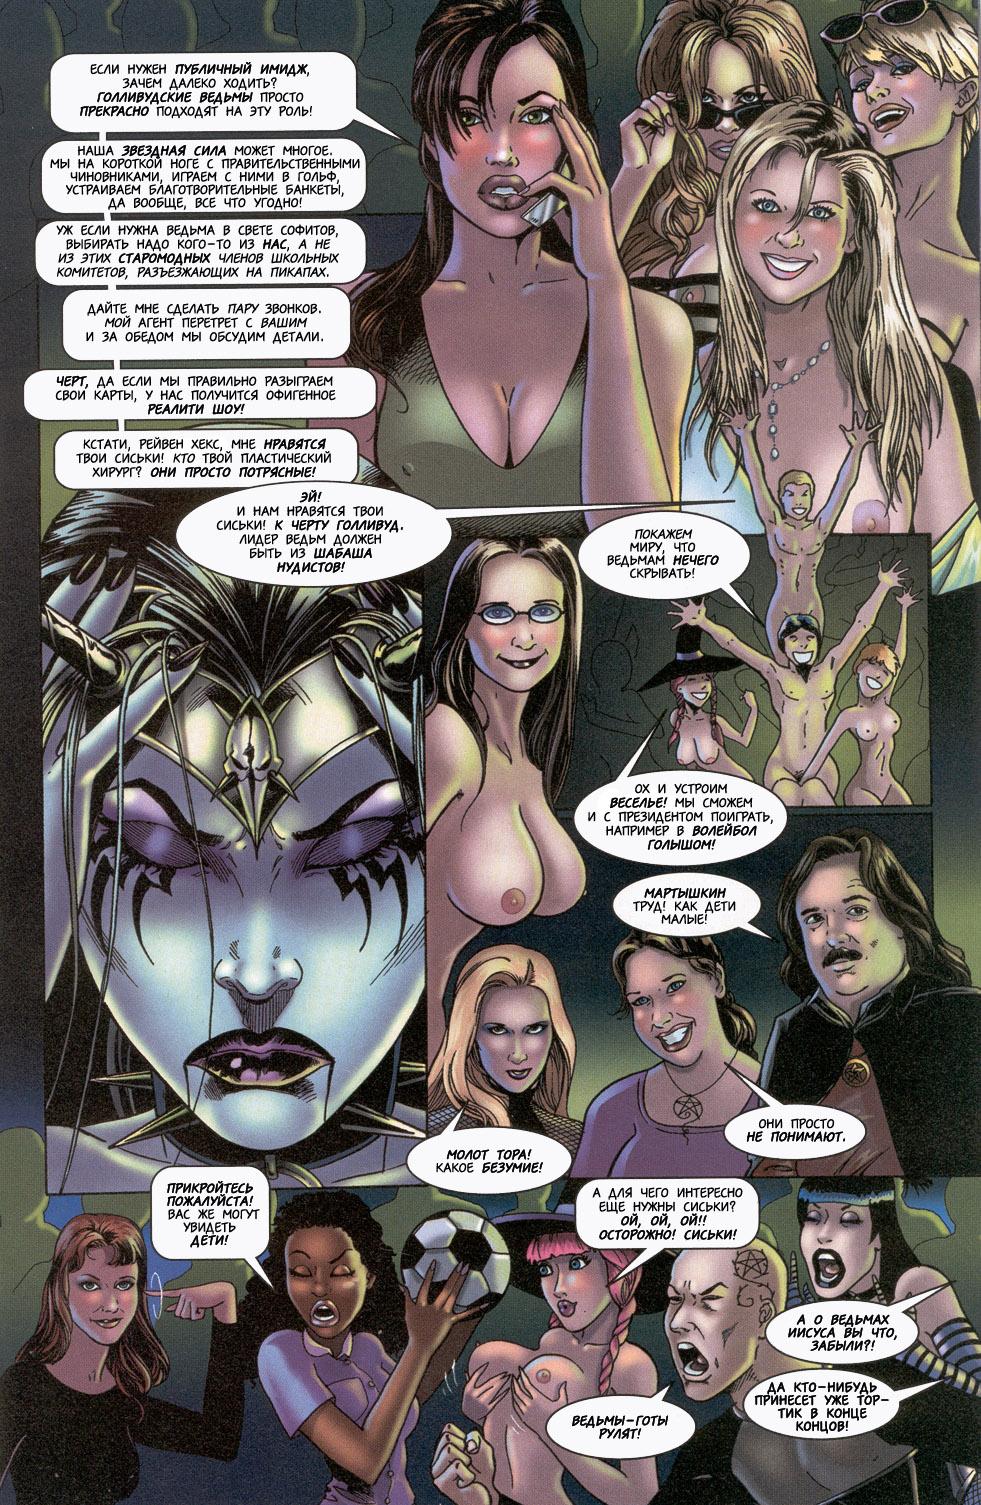 Шабаш ведьм порнокомикс